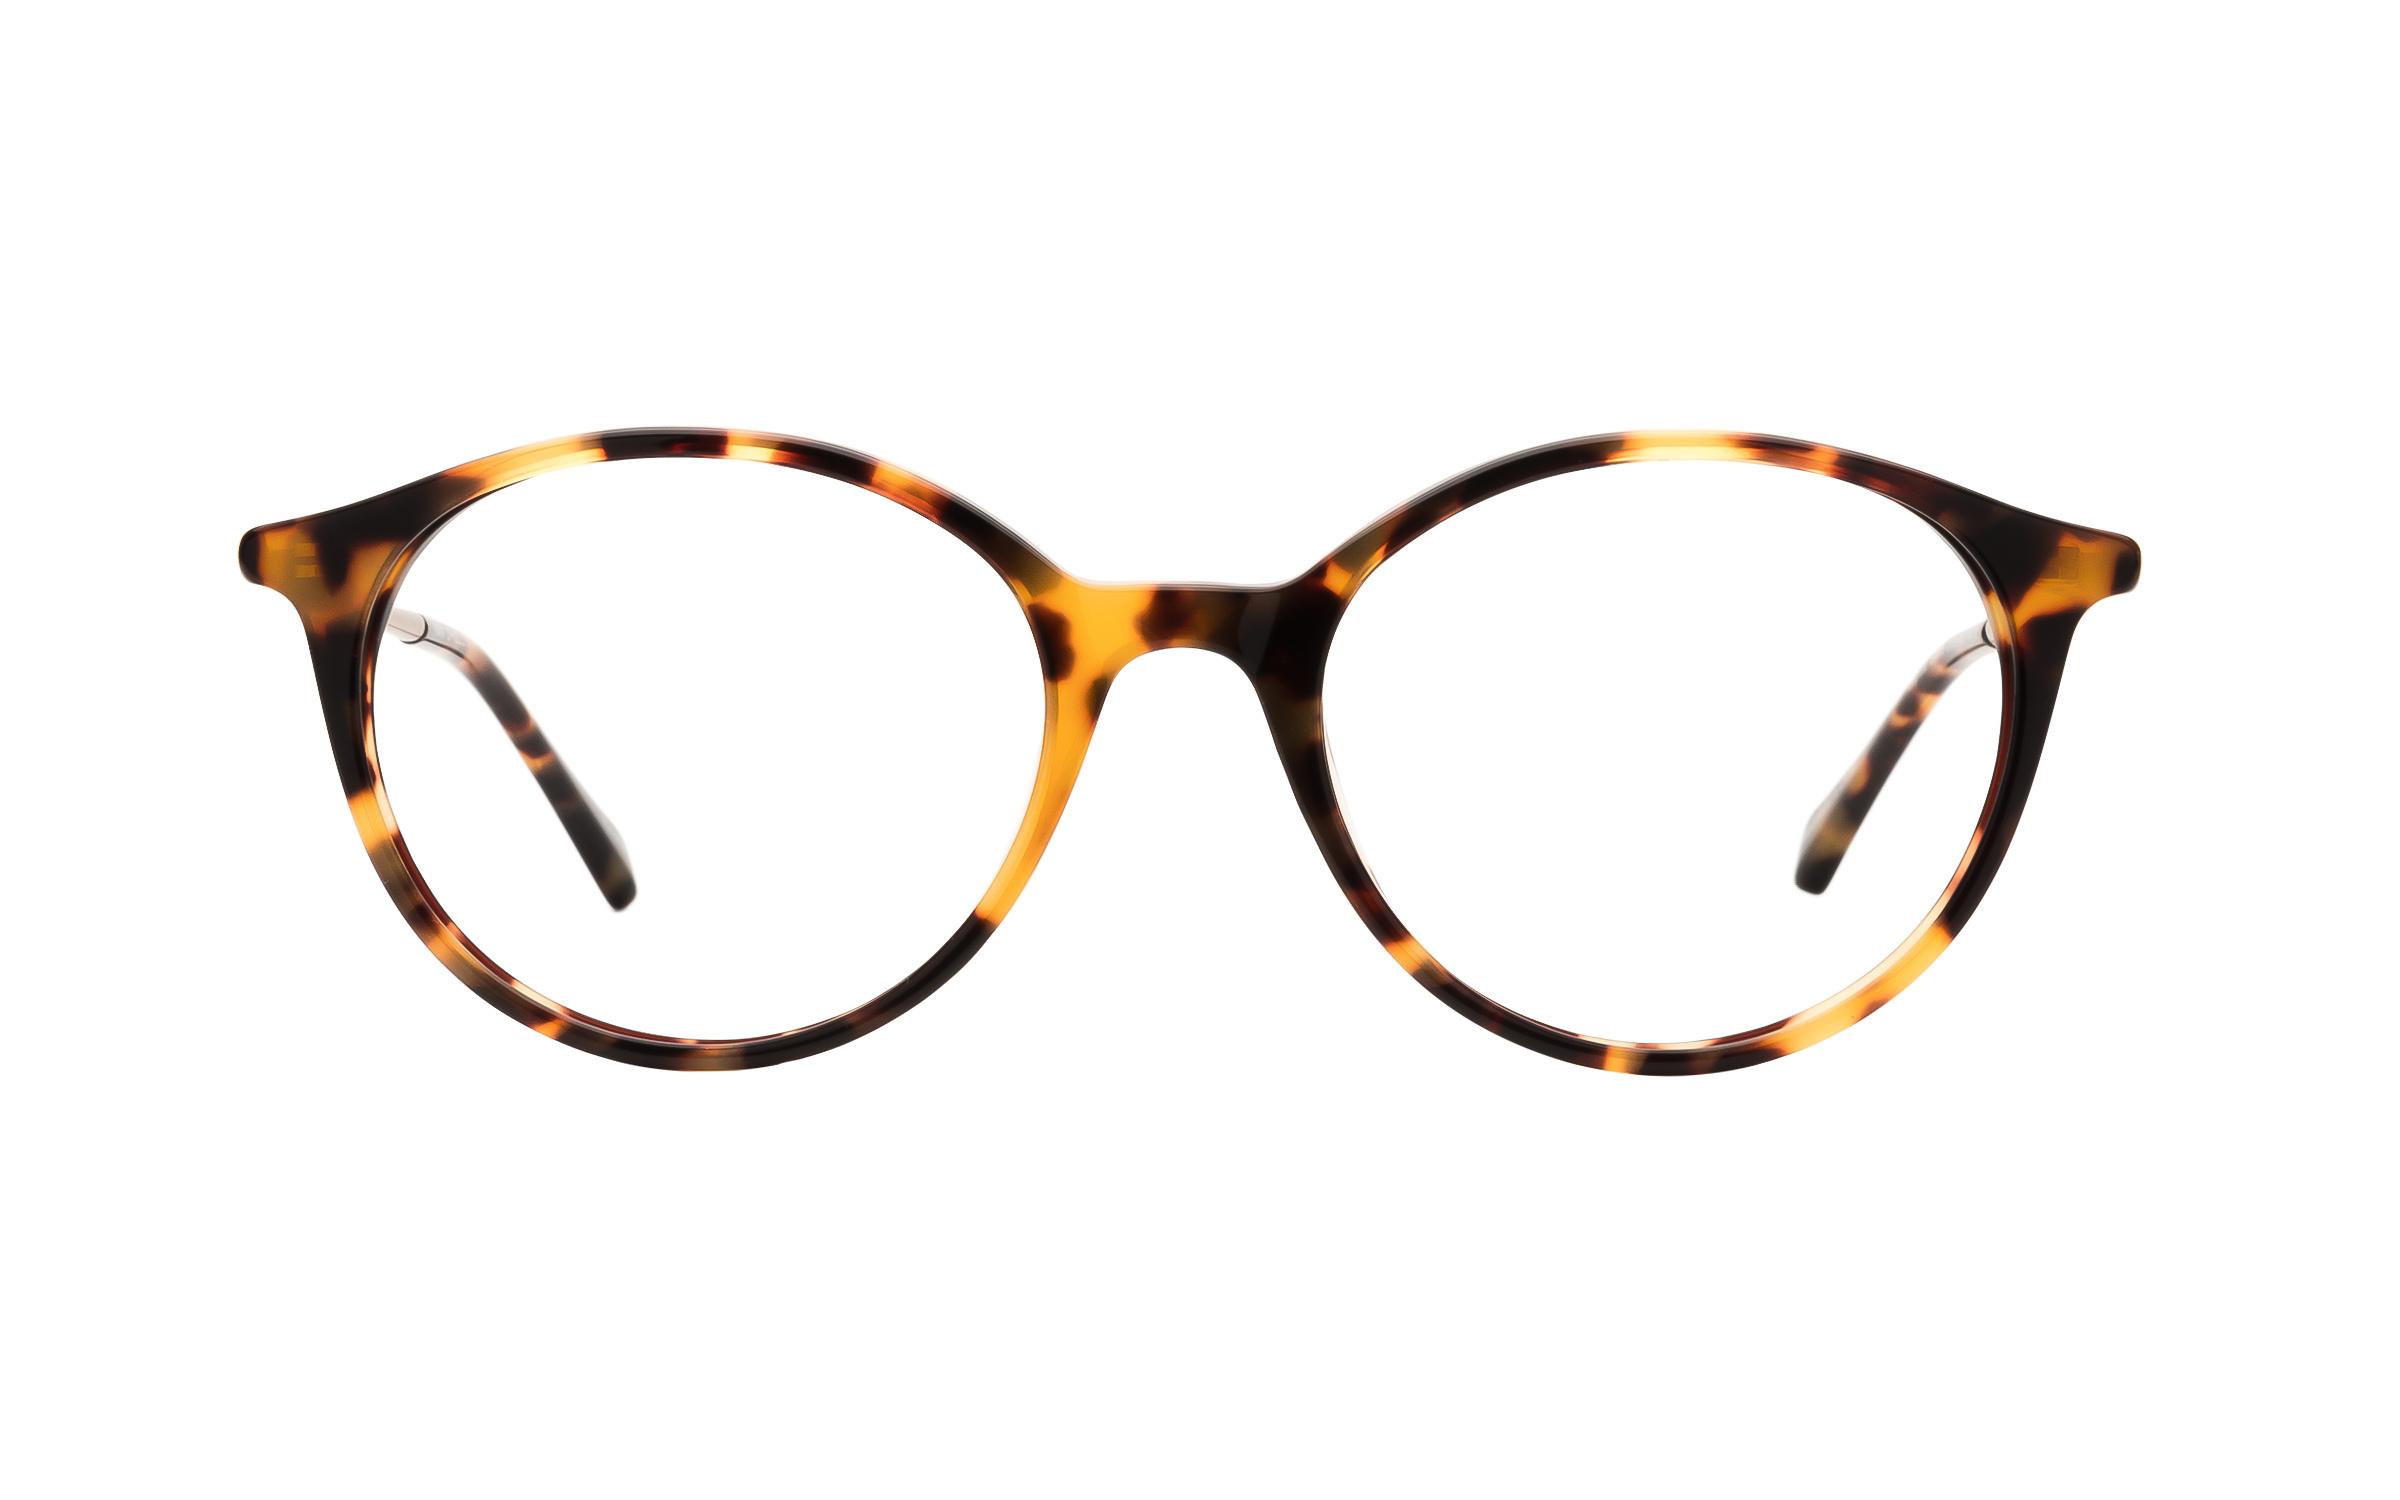 Kam_Dhillon_Womens_Glasses_Round_TortoiseBrownYellow_PlasticMetal_Online_Coastal